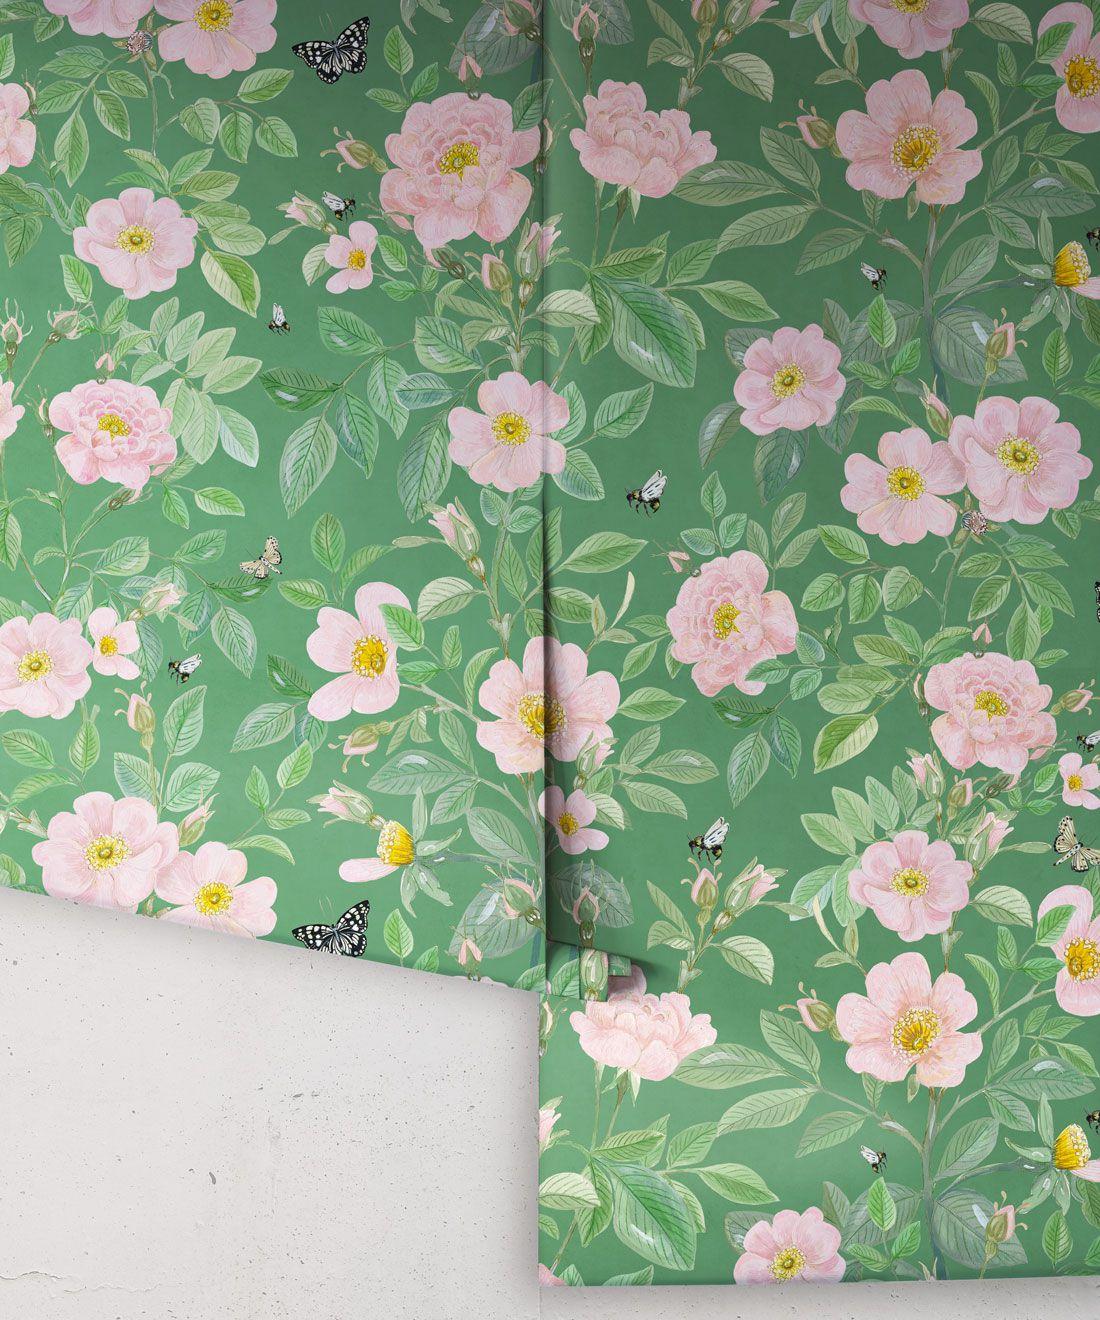 Rosa Wallpaper • Floral Wallpaper •Forest Green • Rolls